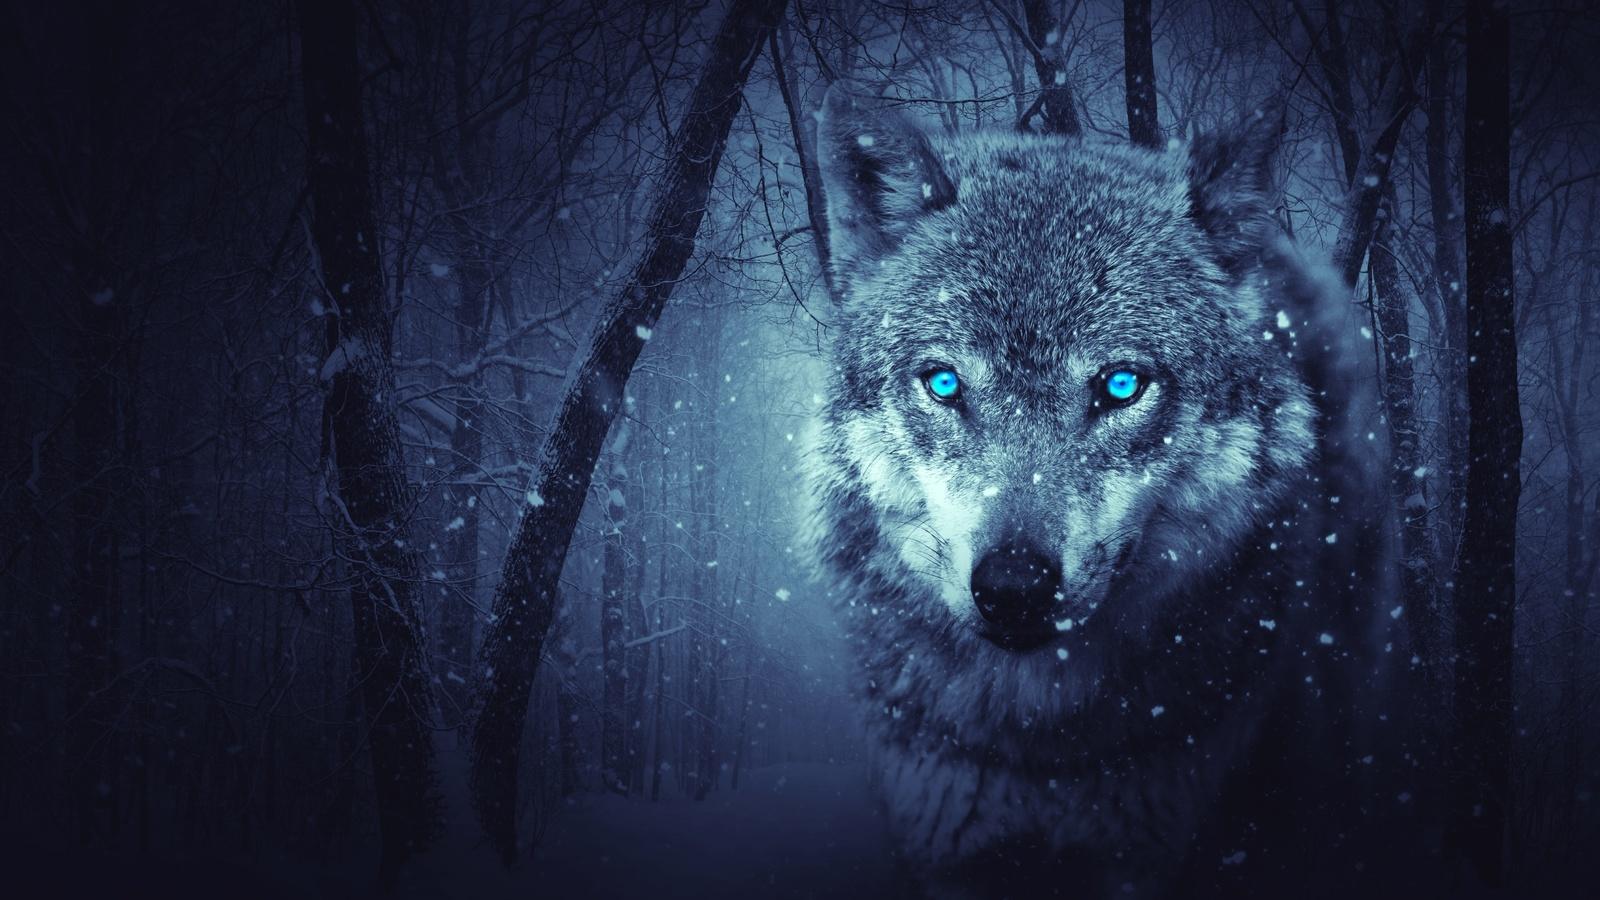 волк, хищник, фотошоп, арт